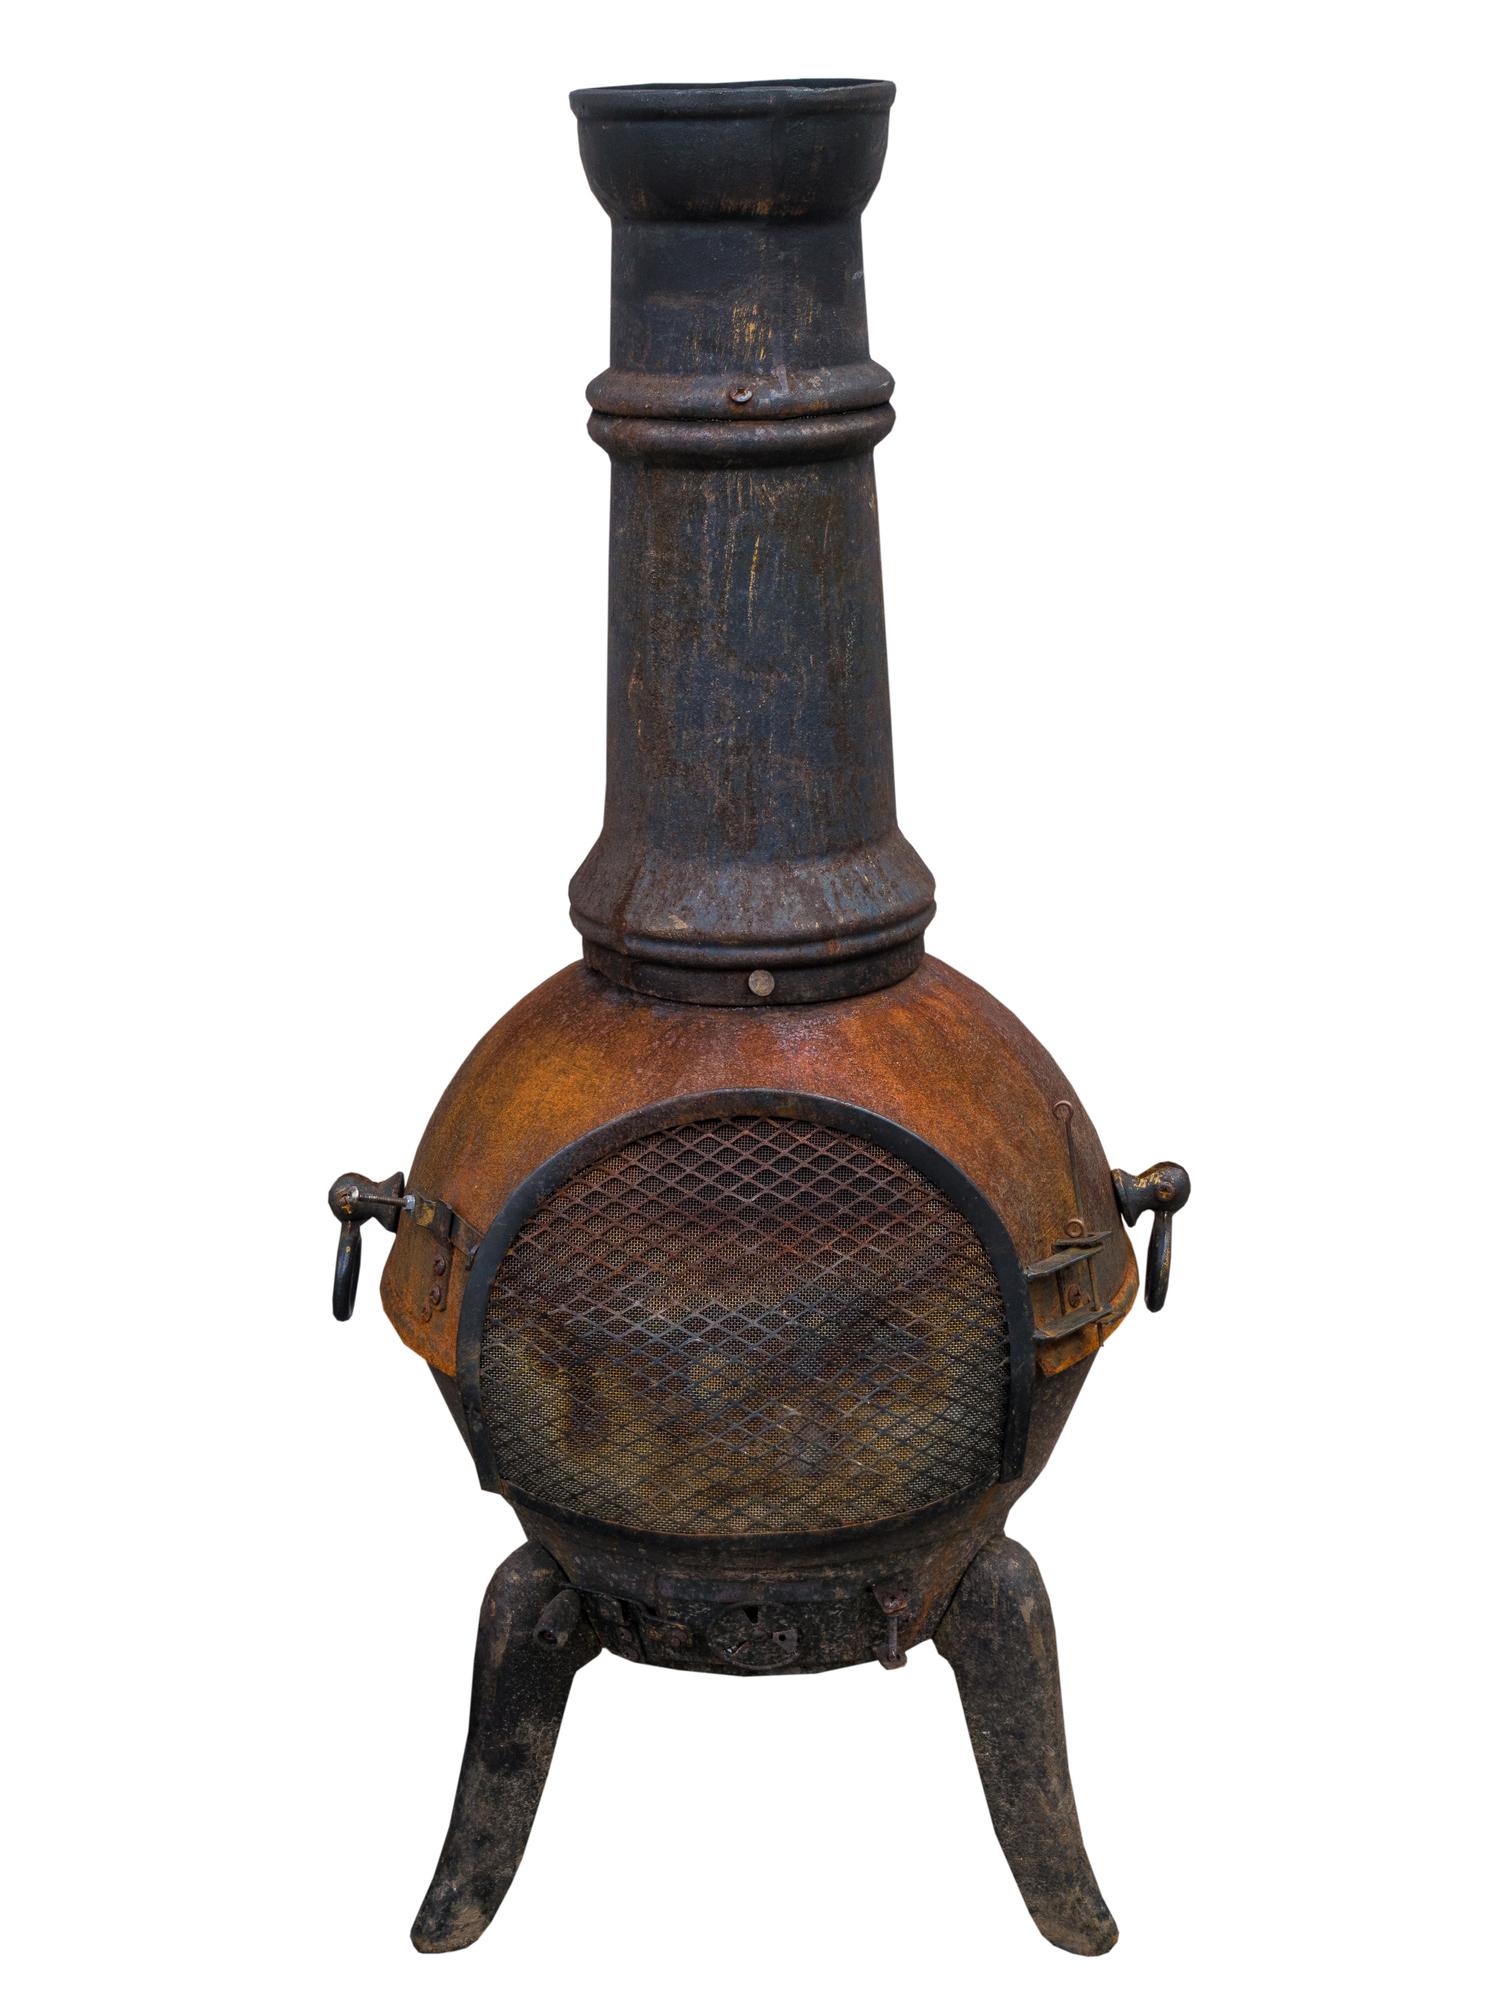 A potbelly stove